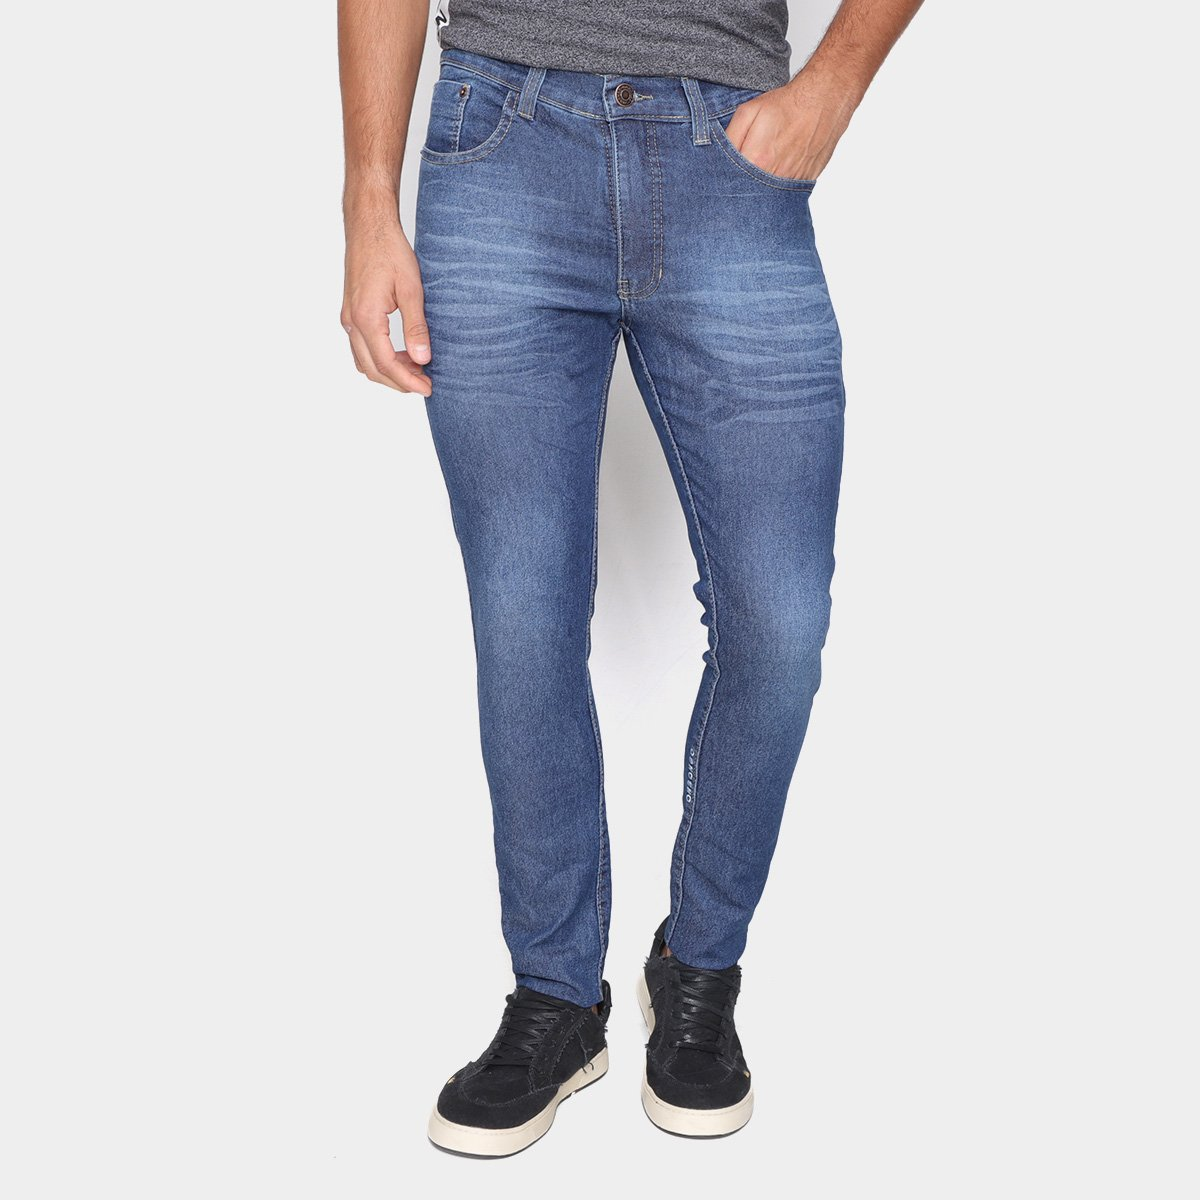 Calça Jeans Onbongo Ski Masculina